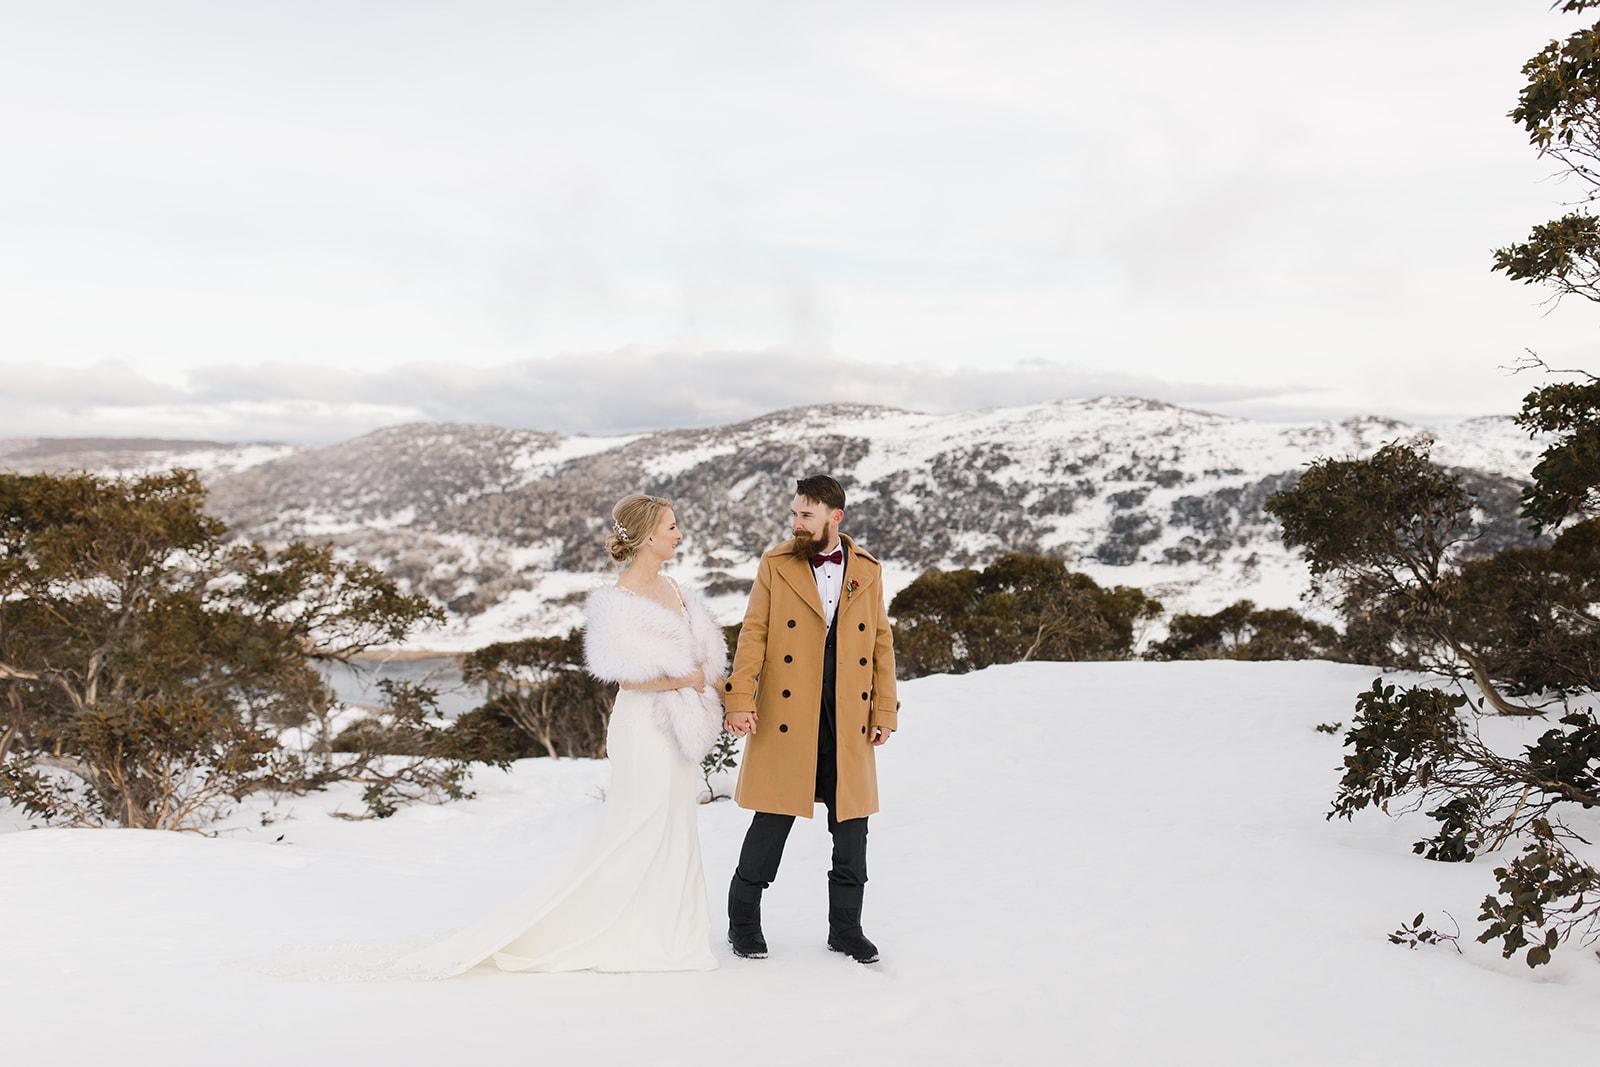 zelda green photographer winter snow mountain weddings bridal gowns cake